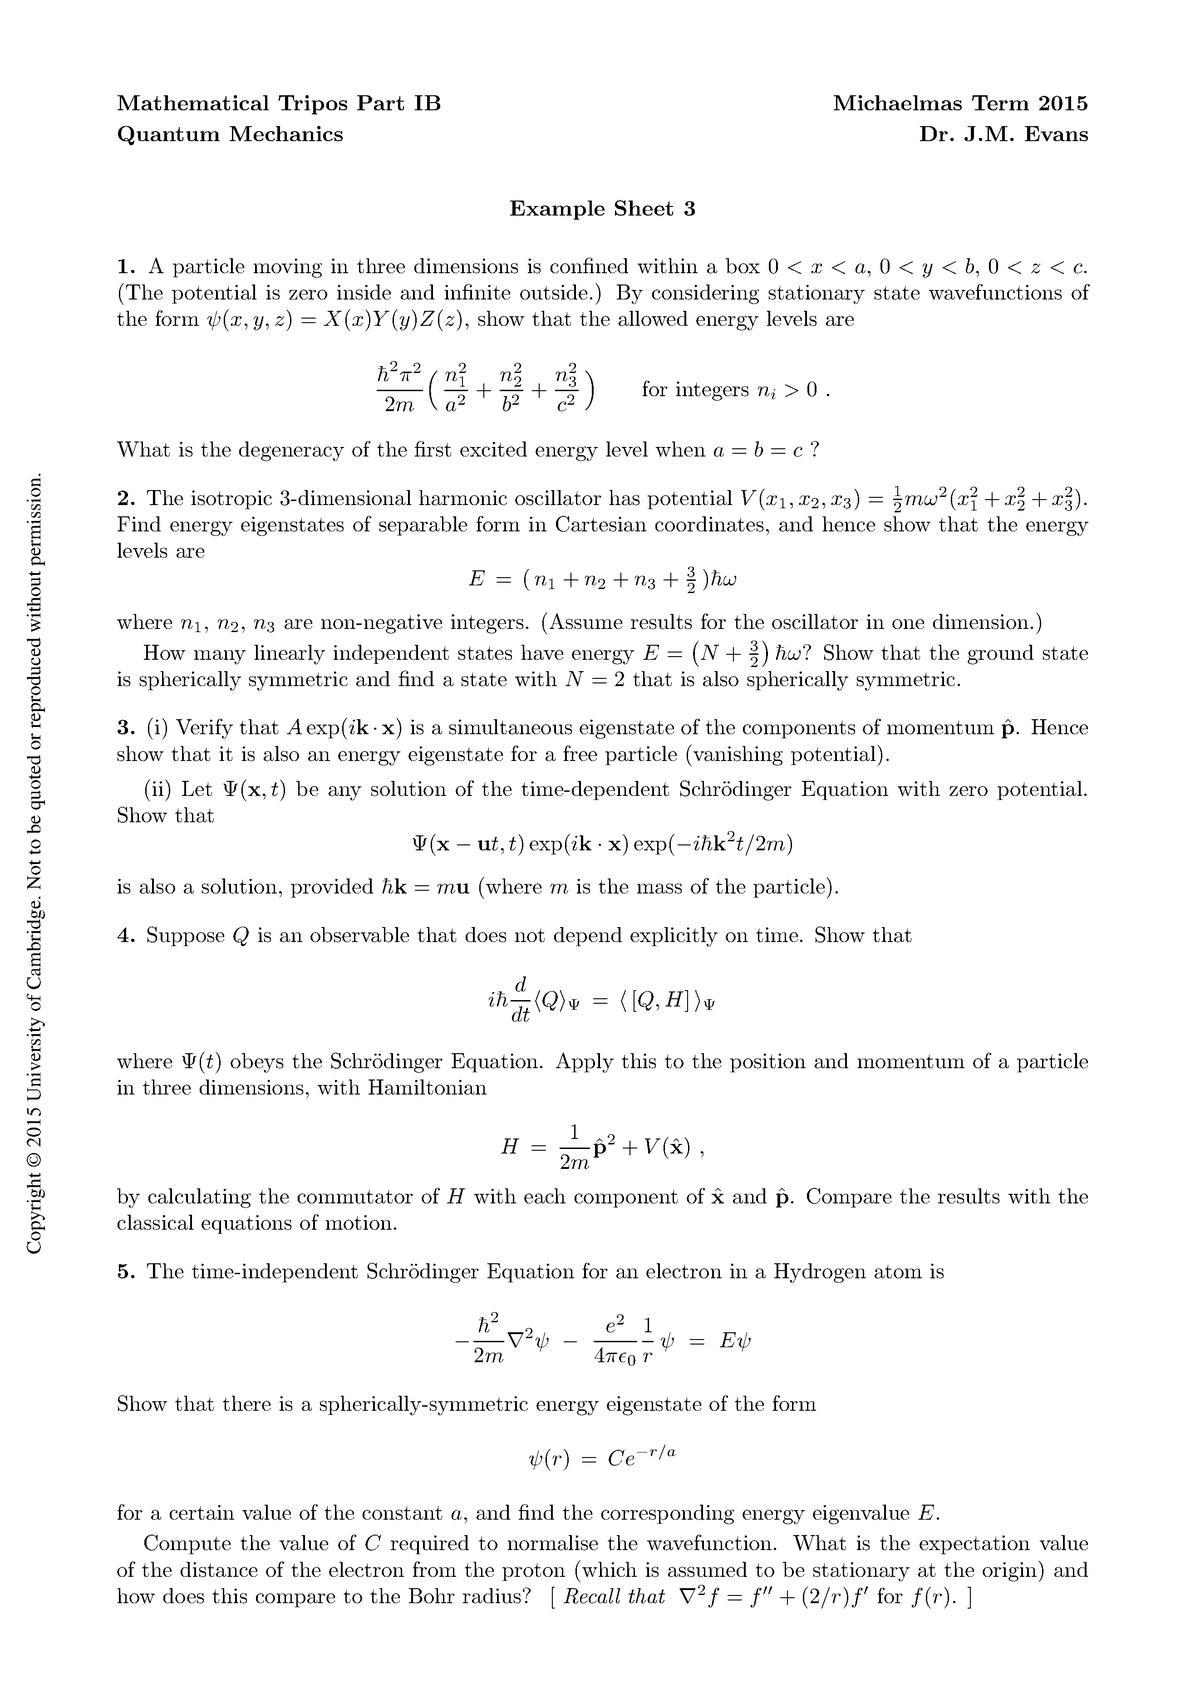 Tutorial work - 3 - Example sheet - B9: Quantum Mechanics - StuDocu